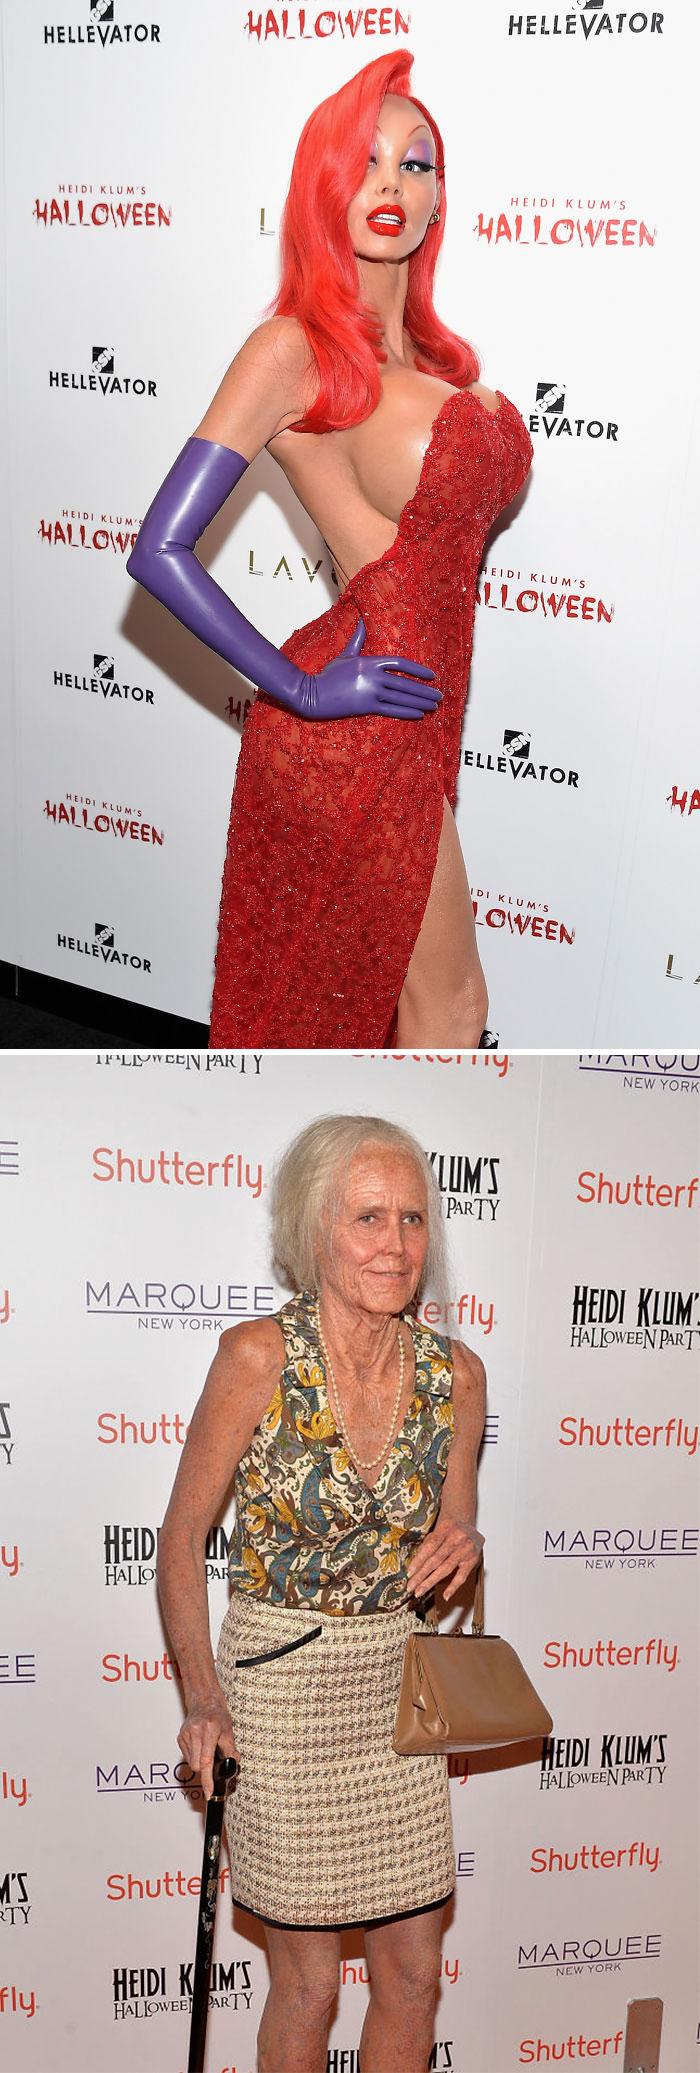 Heidi Klum As Jessica Rabbit And 95-Year-Old Heidi